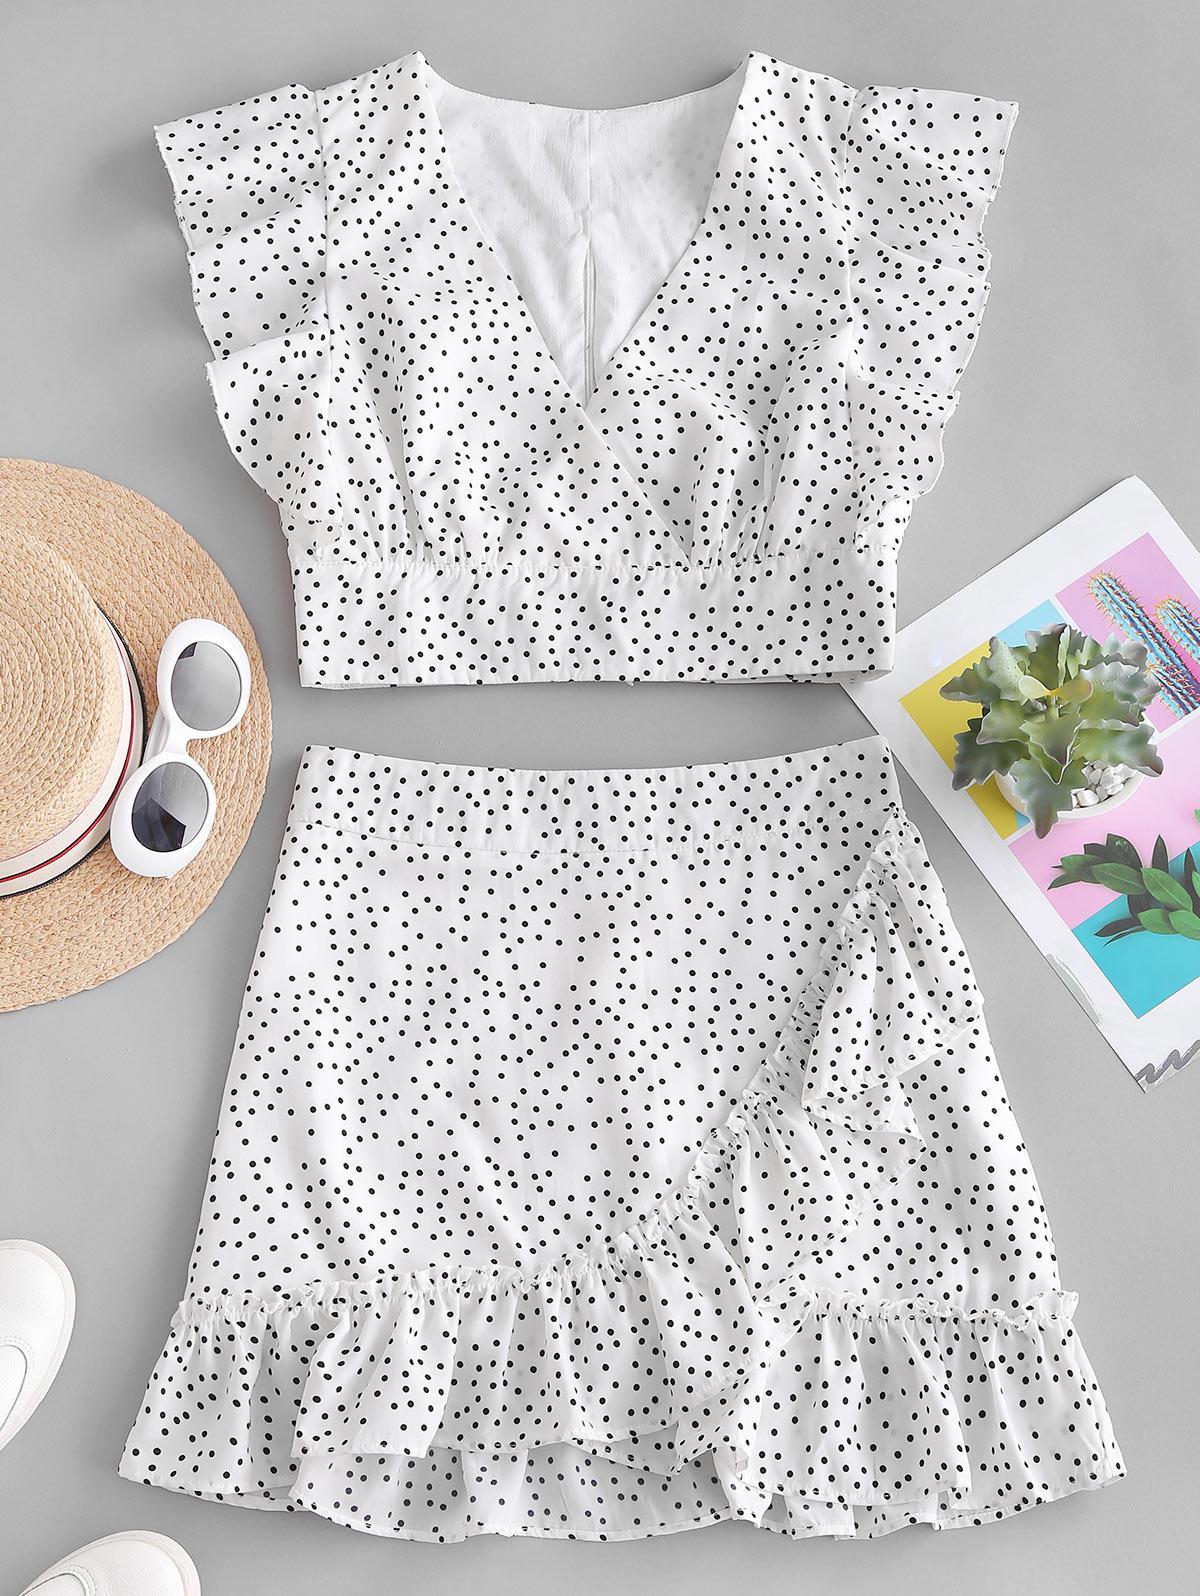 Polka Dot Plunging Ruffle Skirt Set, White